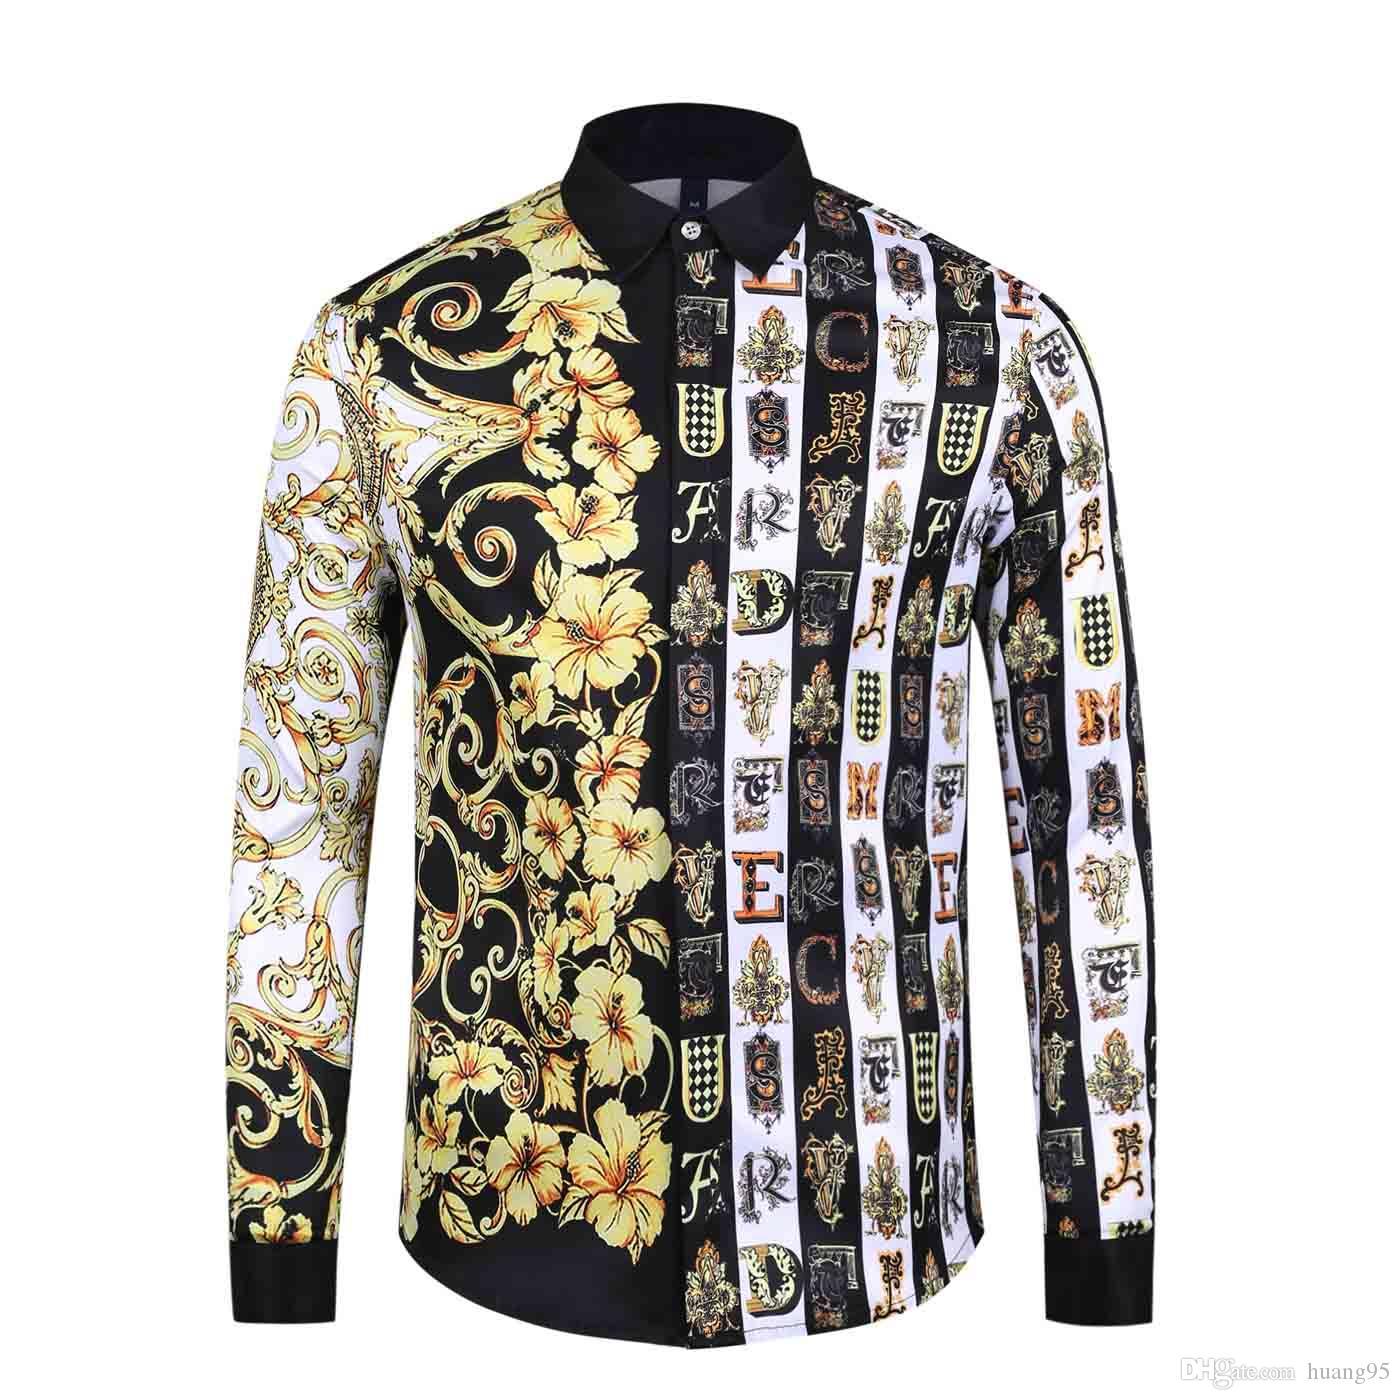 2019 moda masculina con estampado floral color alto grado ocio Harajuku camisa de manga larga color mezcla color masculino camisa Medusa